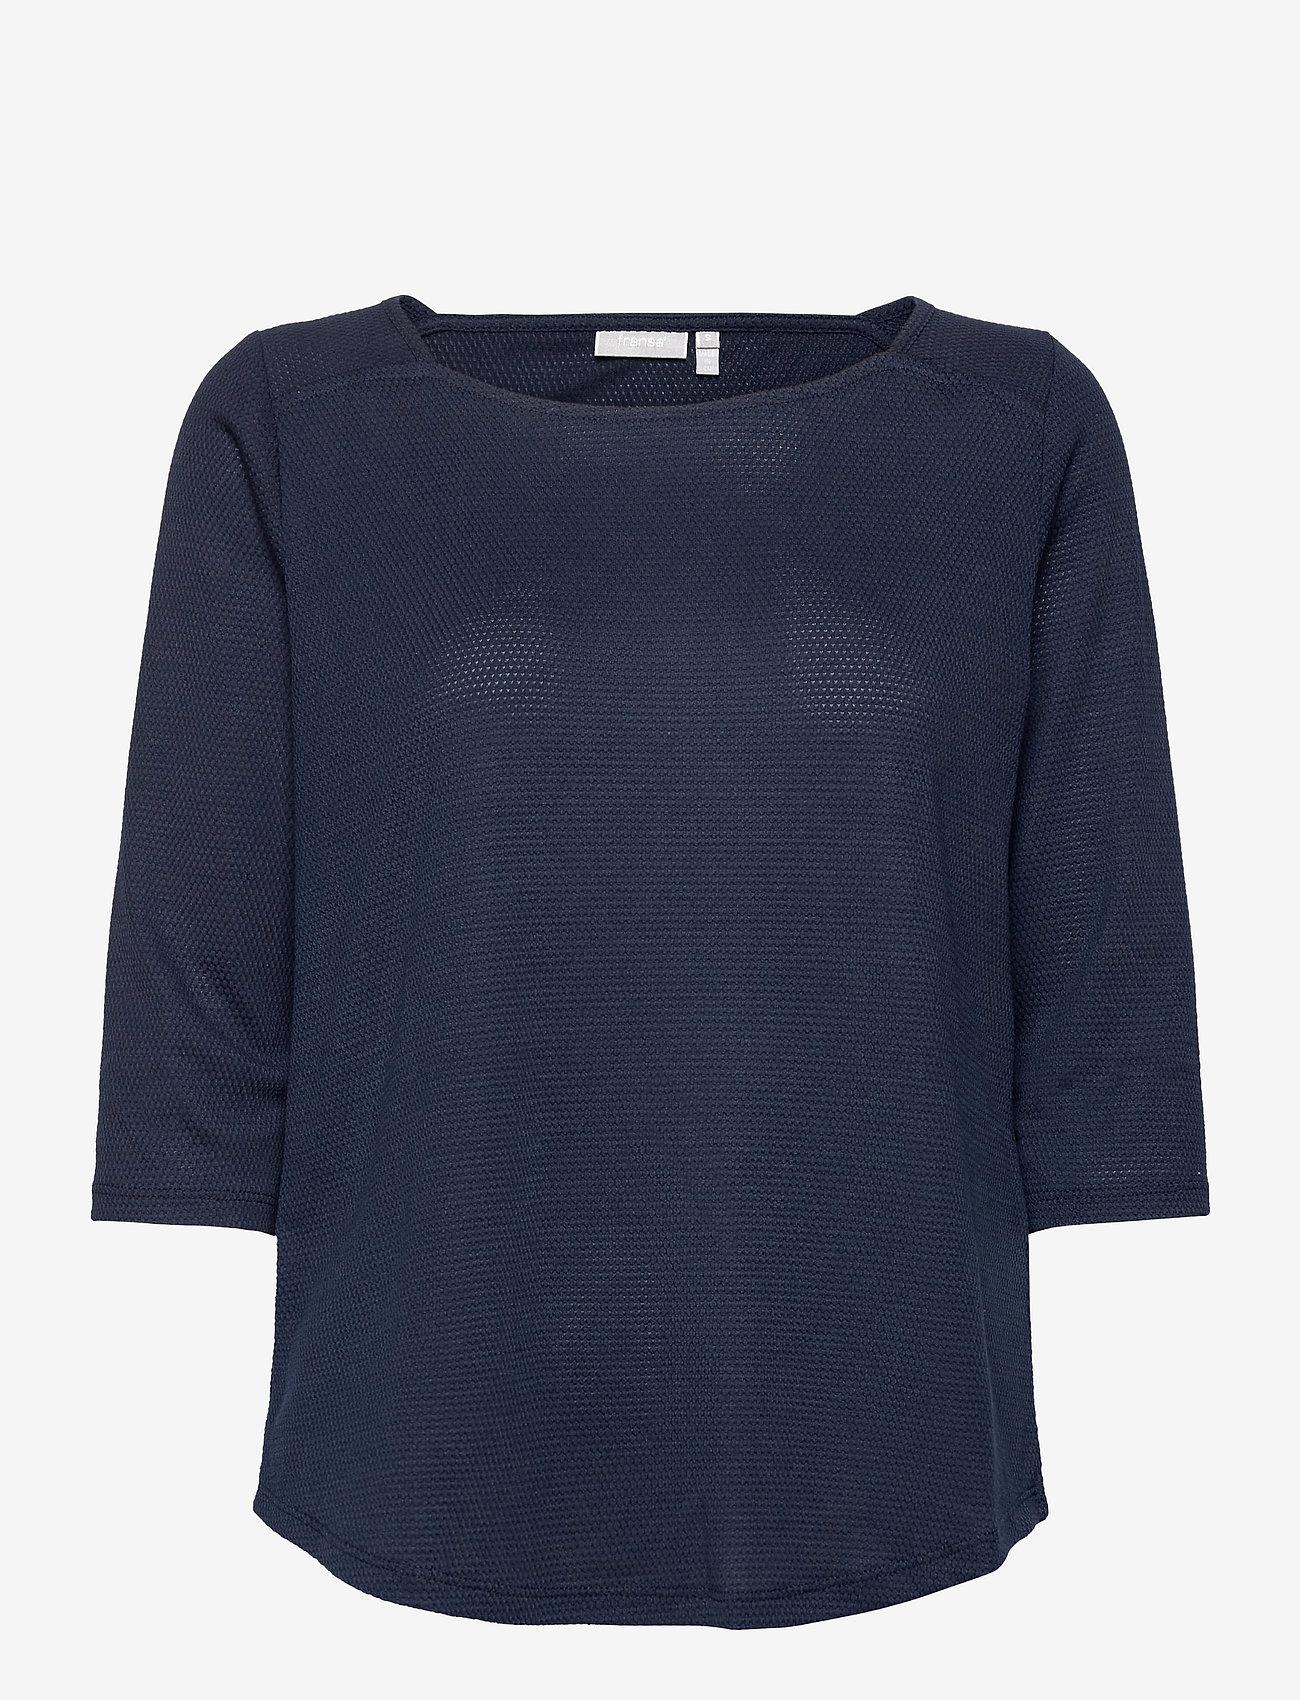 Fransa - FRPEJACQ 1 T-shirt - pitkähihaiset t-paidat - navy blazer - 0